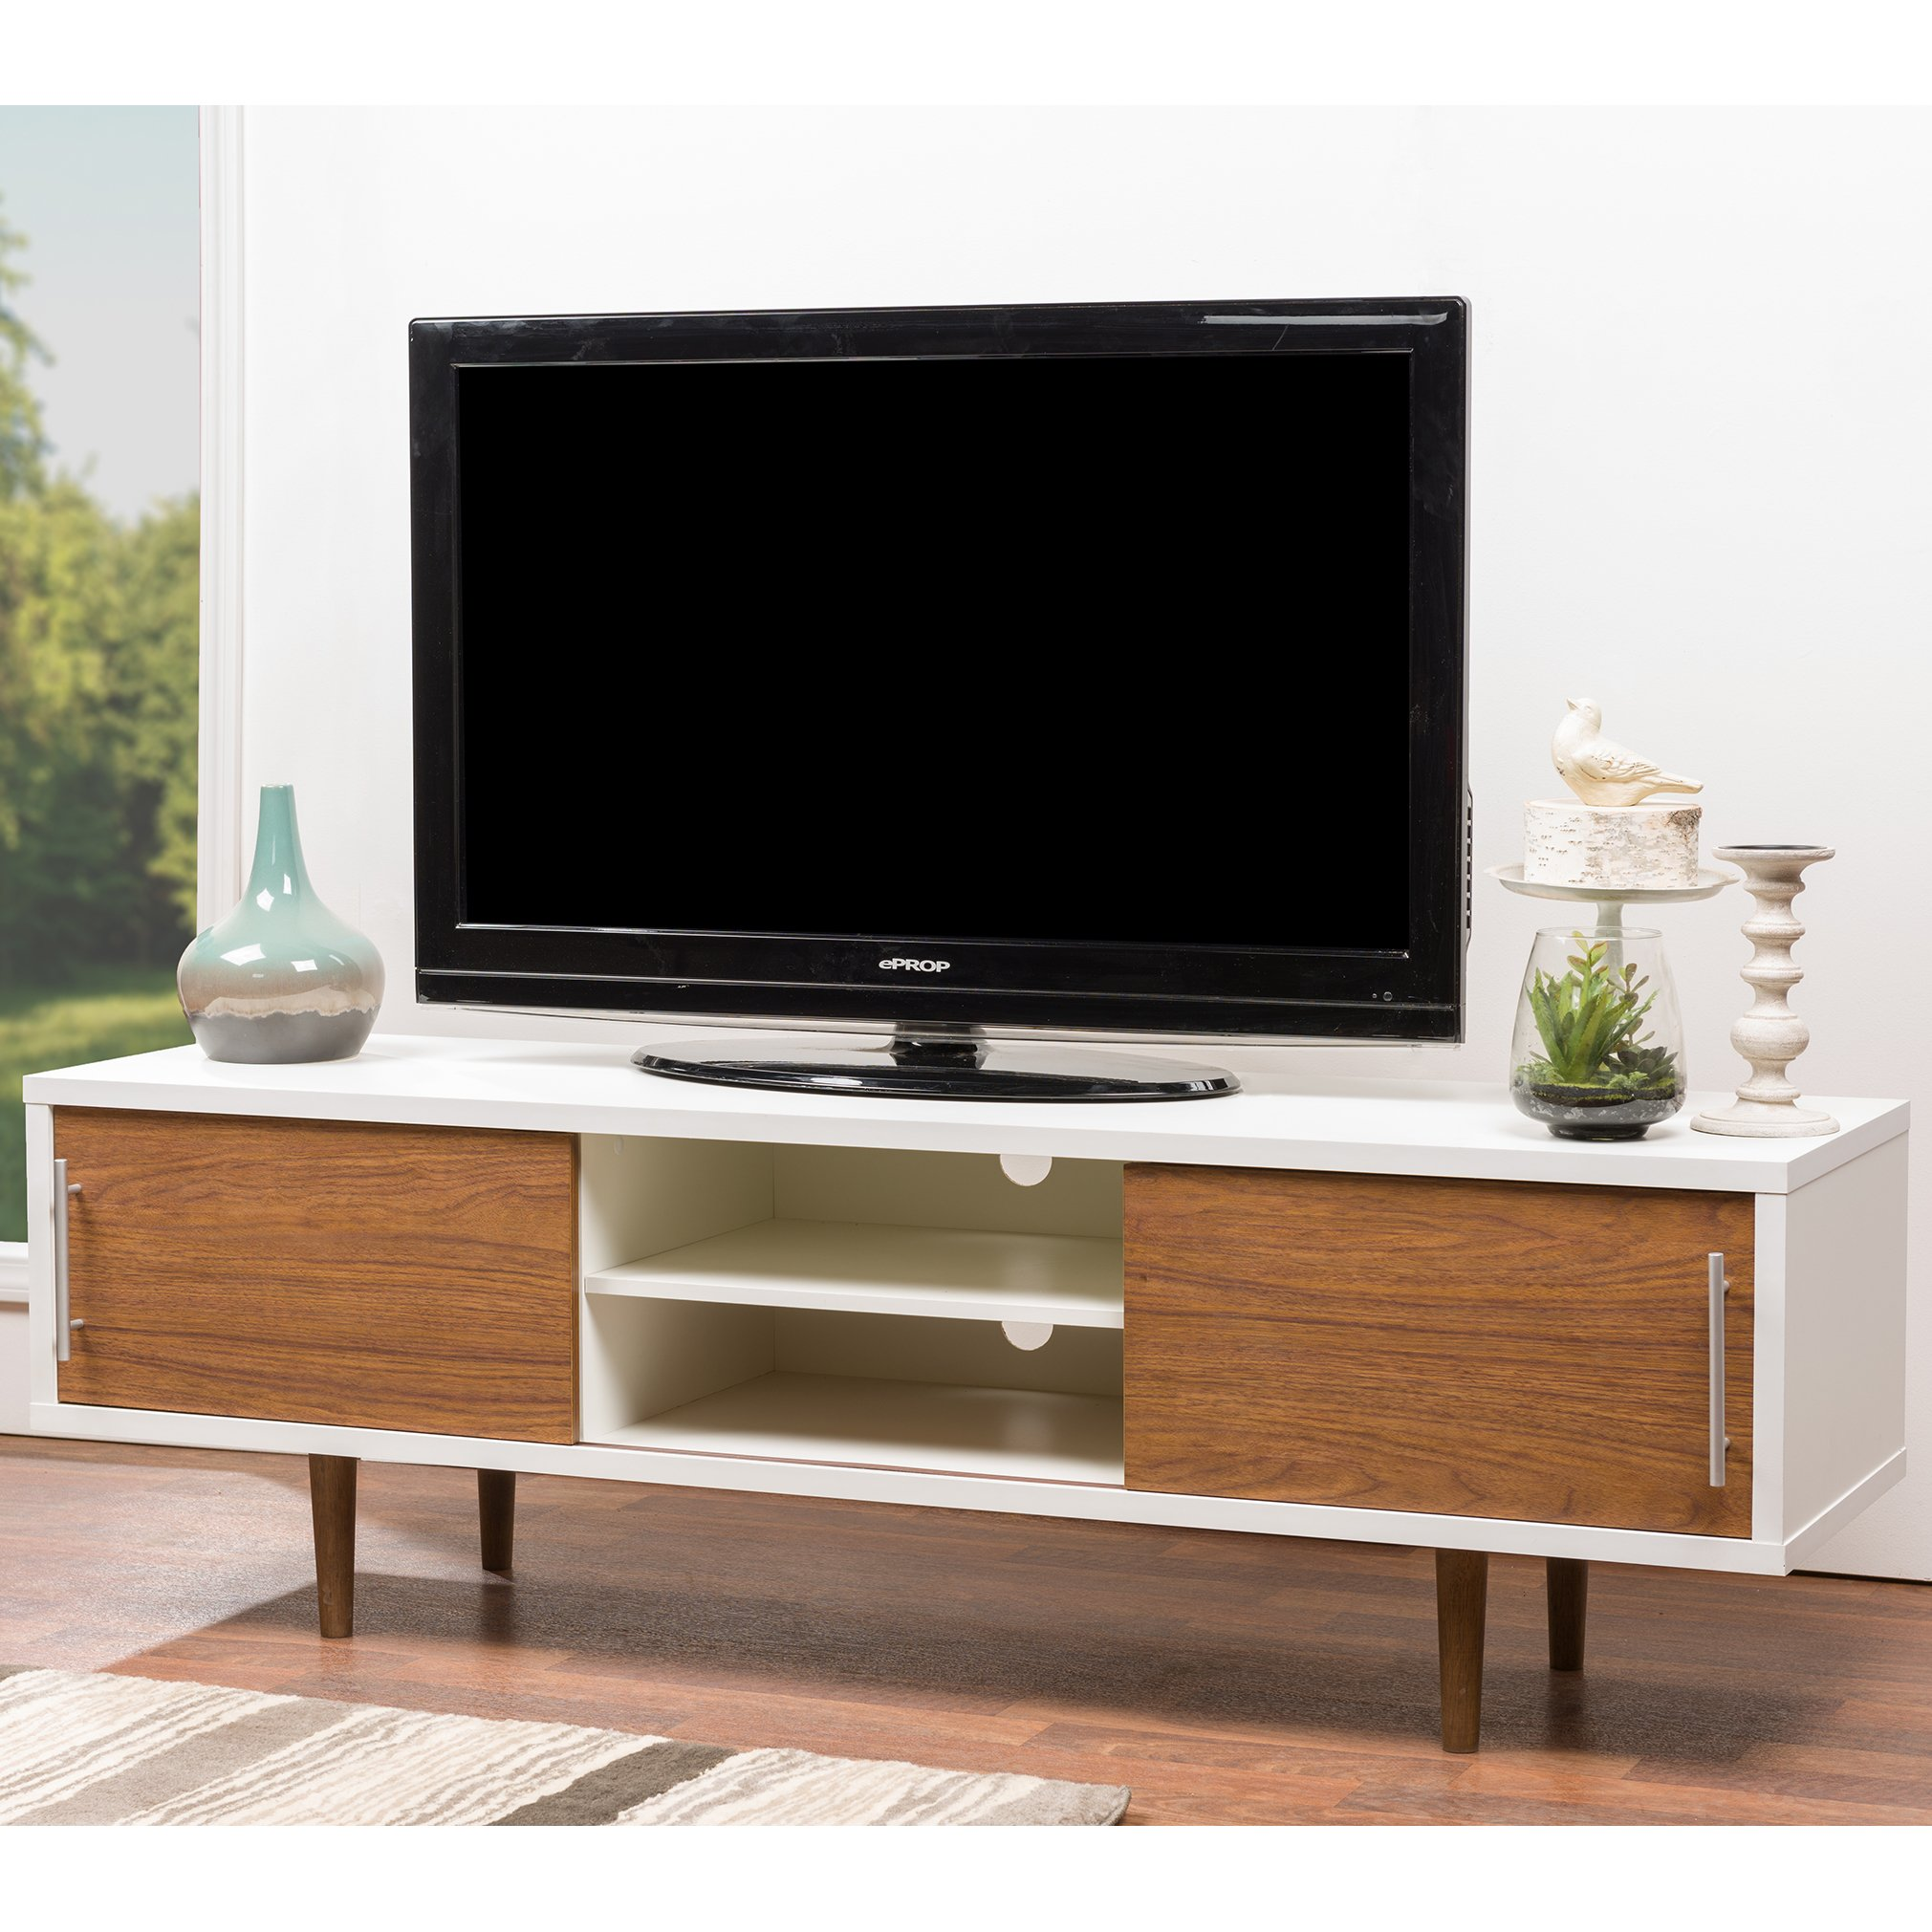 Baxton Studio Gemini Wood Contemporary TV Stand, White by Baxton Studio